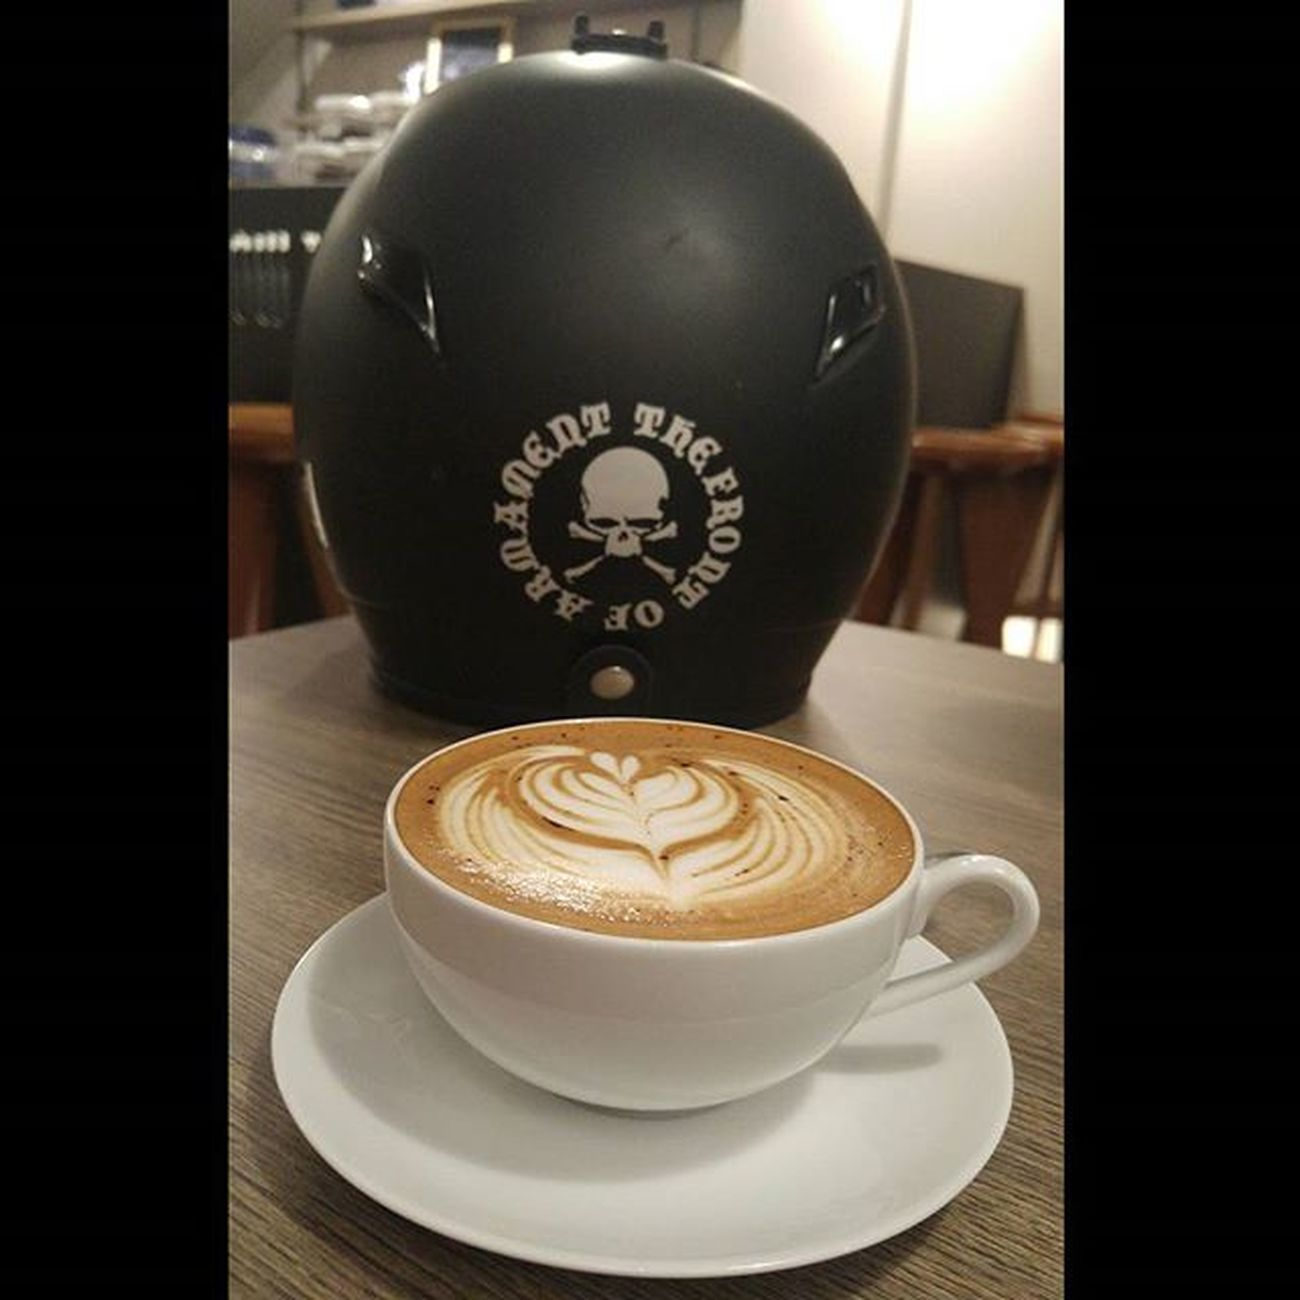 Helmet Tfoa Crowsxworst Coffee Coffeetime Mochaccino Coffeesesh Lcbbandung Val  2016 LGG4 LG  G4 ☕